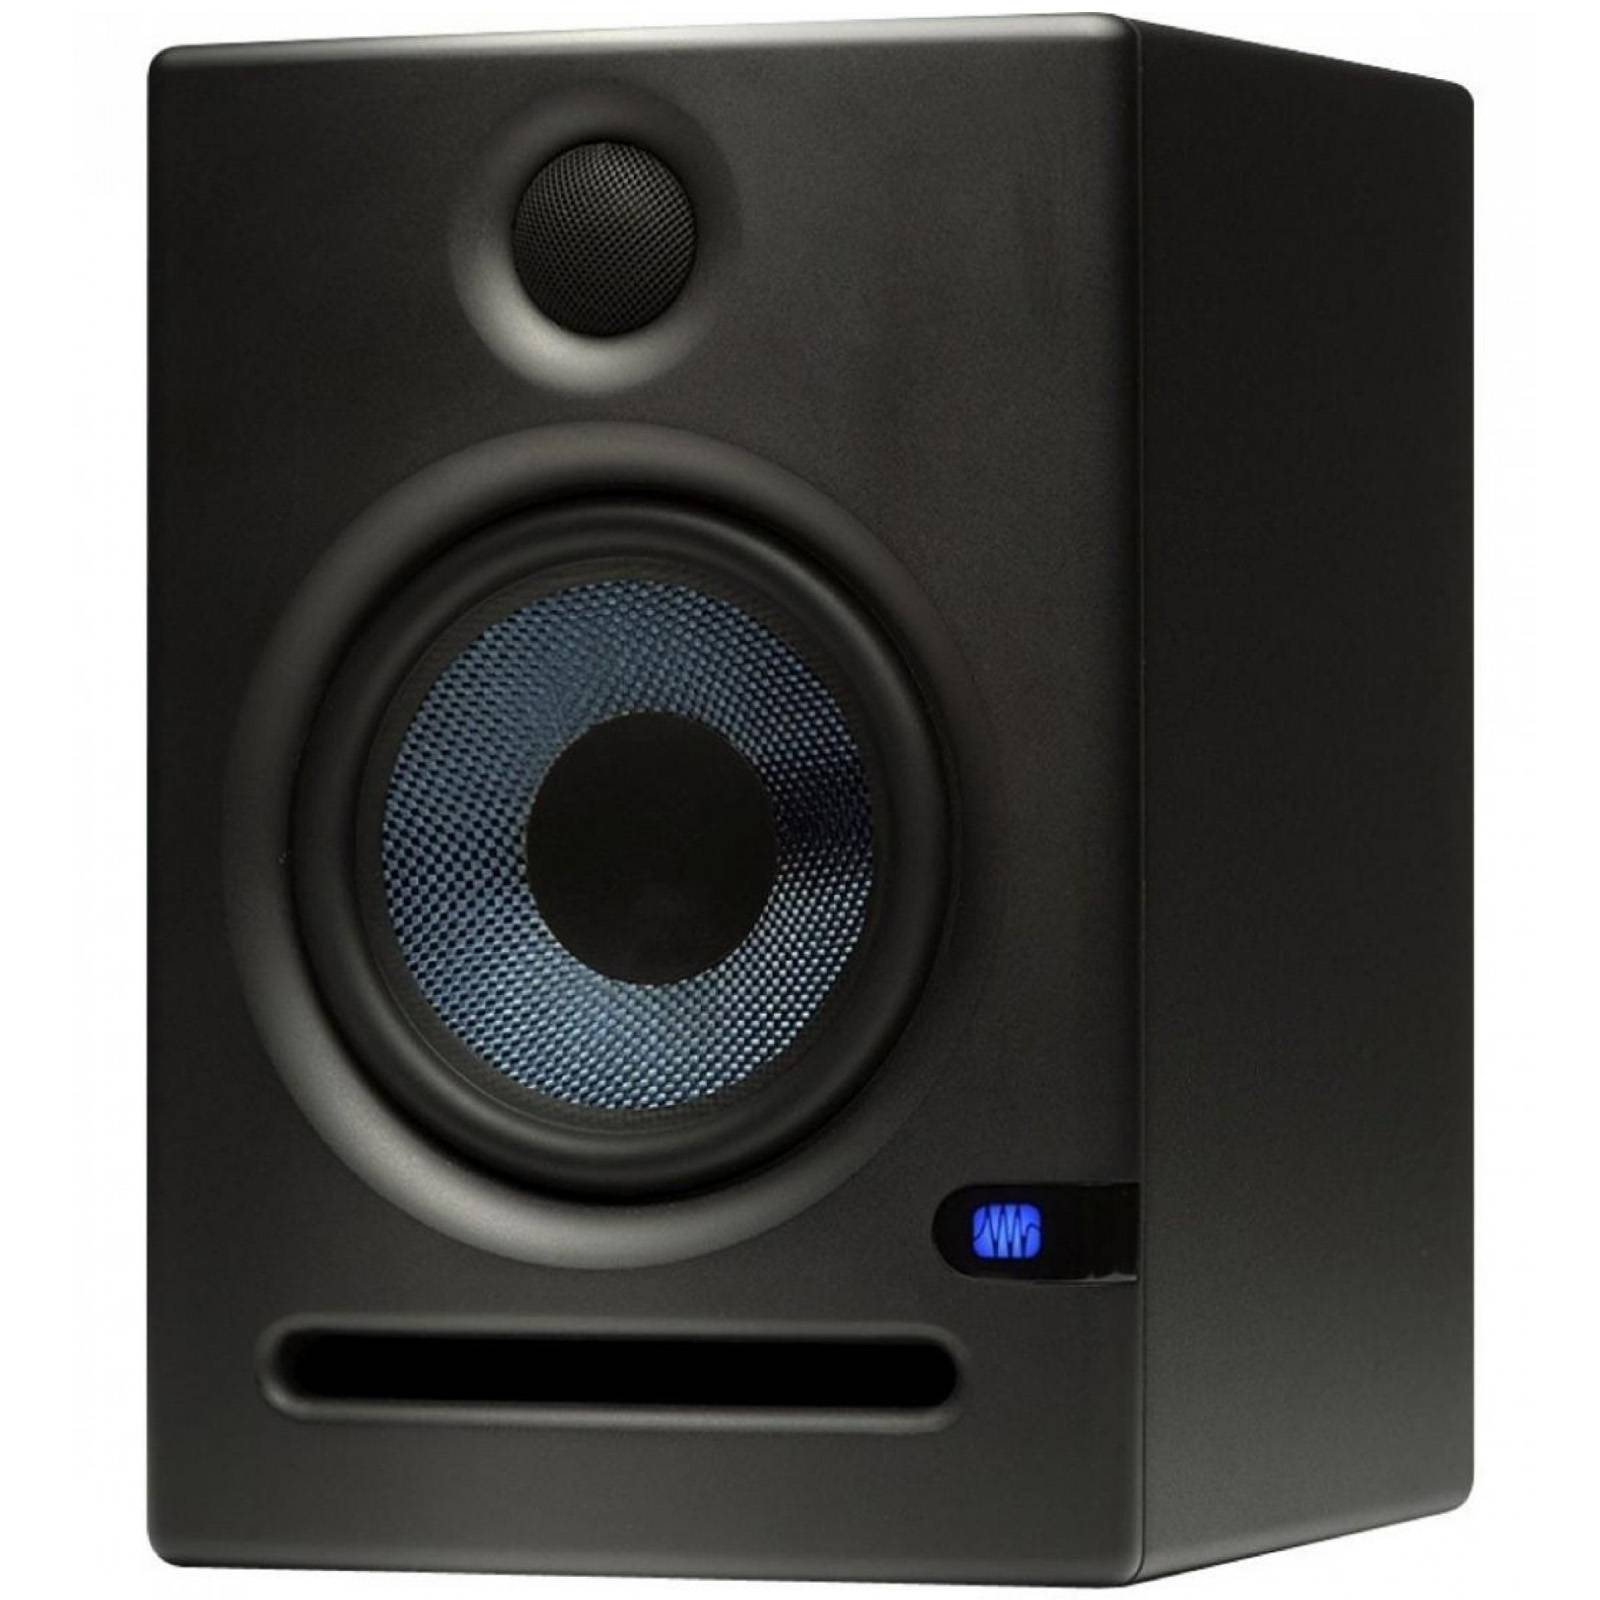 presonus eris e5 studio speaker kit studio monitor speakers from inta audio uk. Black Bedroom Furniture Sets. Home Design Ideas